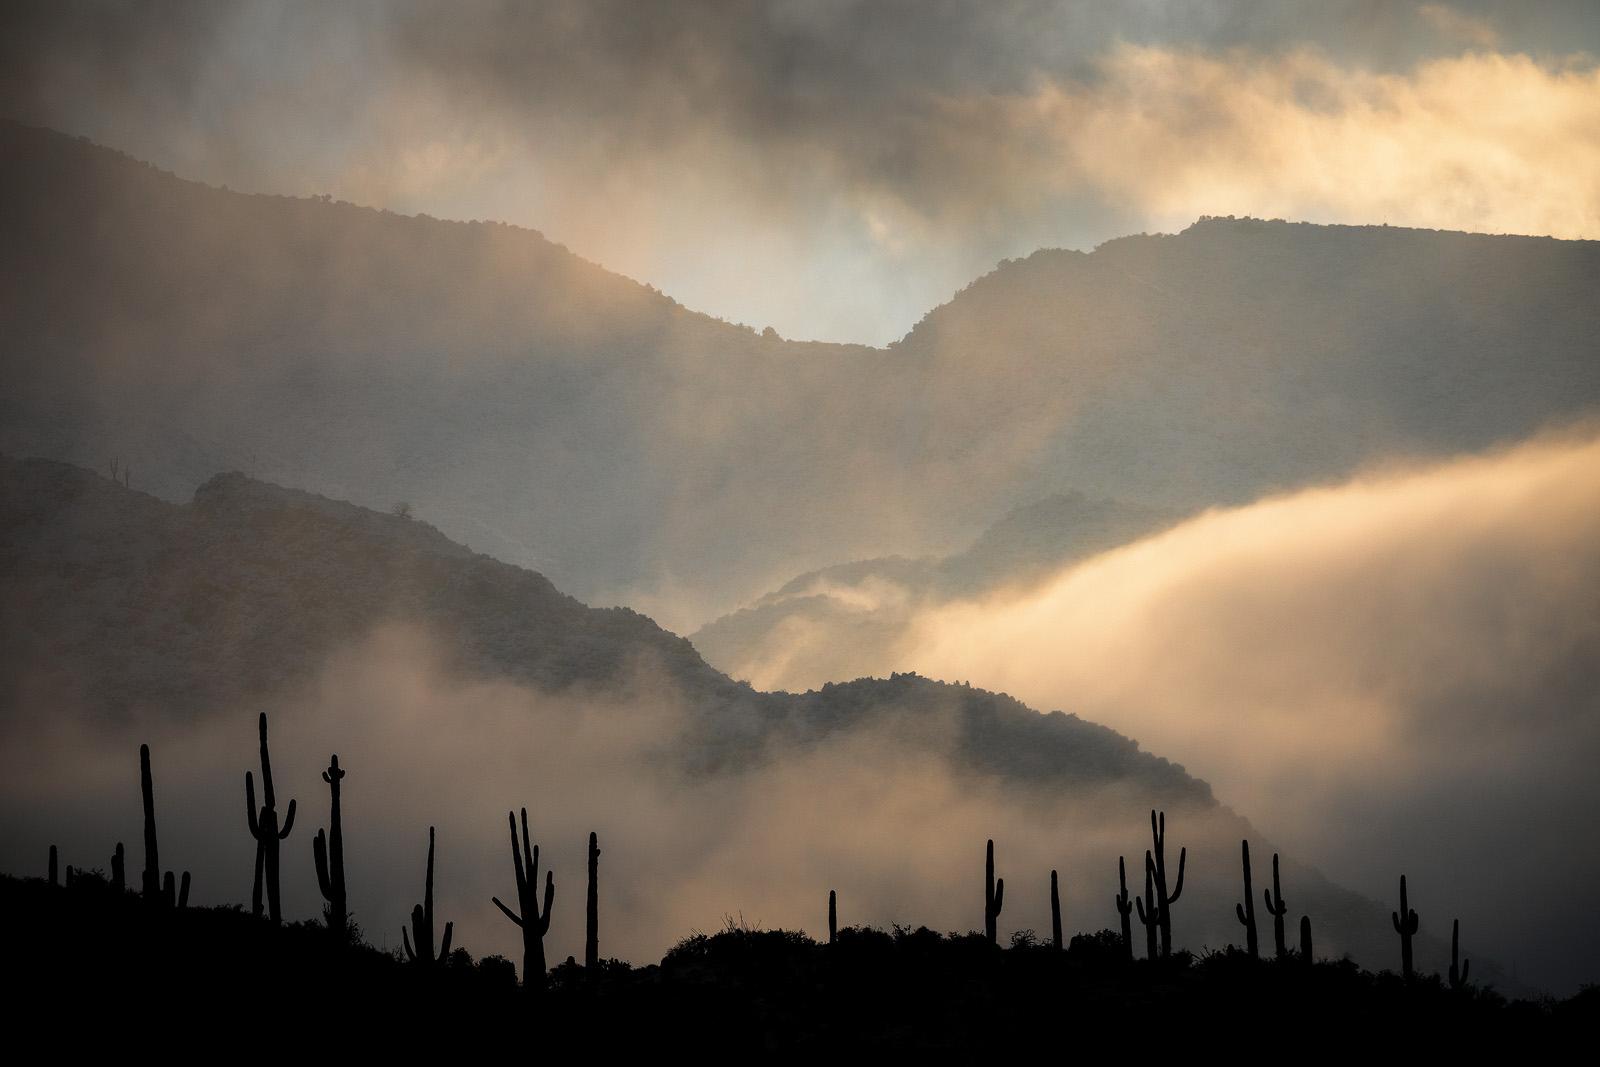 Sonoran_Winter_